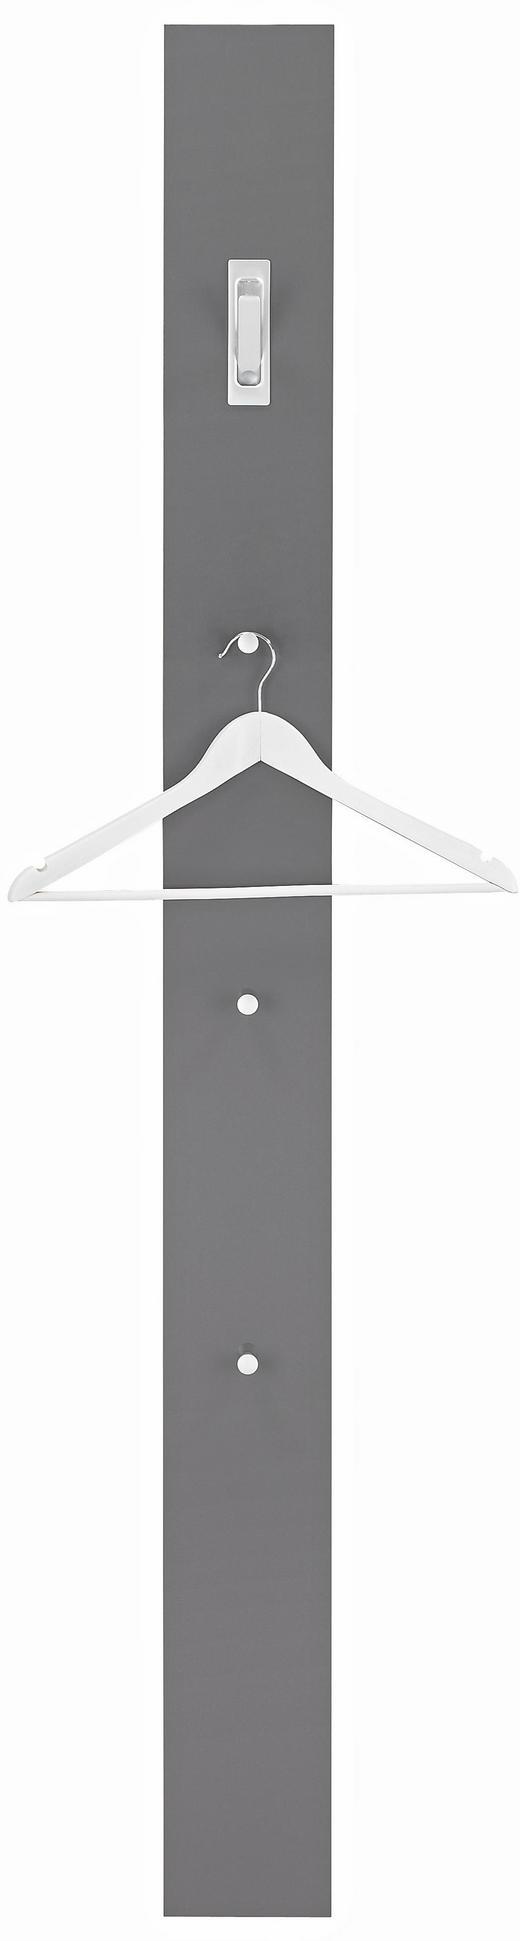 GARDEROBENPANEEL Anthrazit - Anthrazit, Design, Kunststoff (15/170/2,5cm)